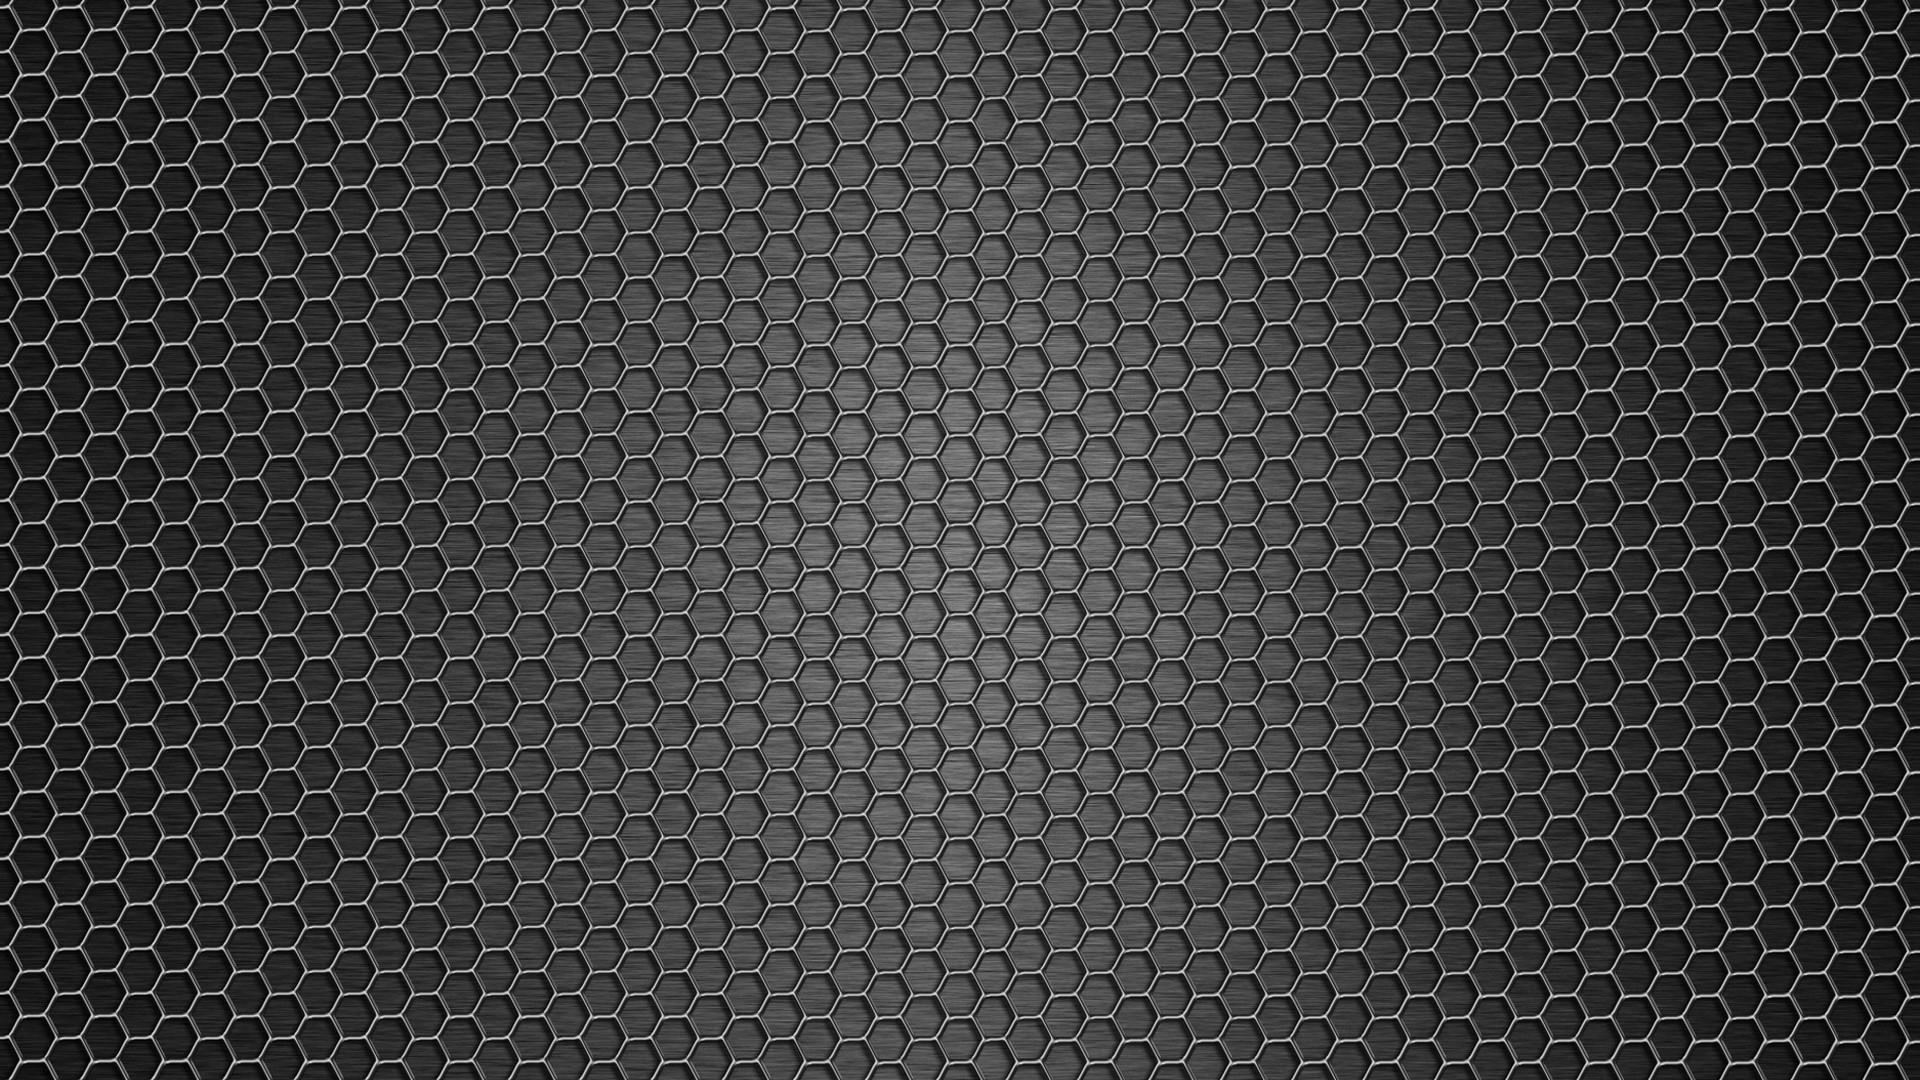 Technology Background With Circular Mesh: Wallpaper : Black, Dark, Pattern, Metal, Texture